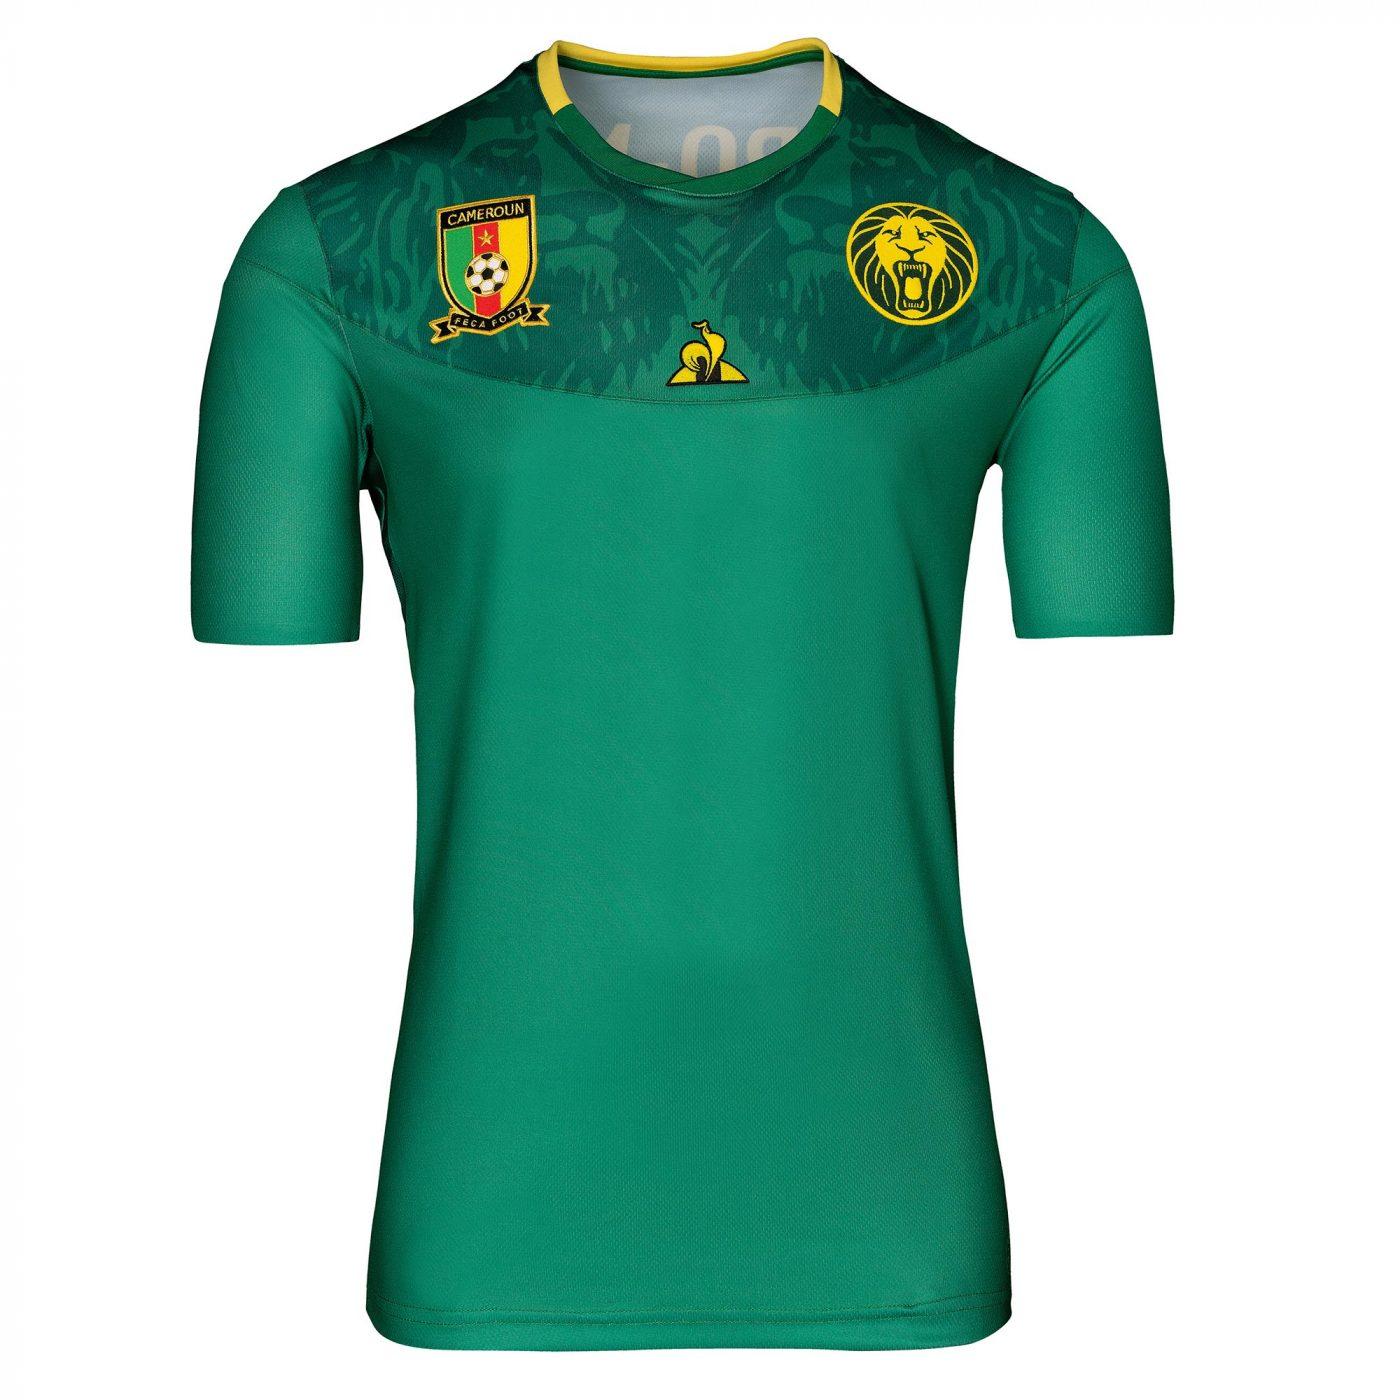 maillot-domicile-cameroun-can-2019-coupe-du-monde-feminine-2019-le-coq-sportif-1